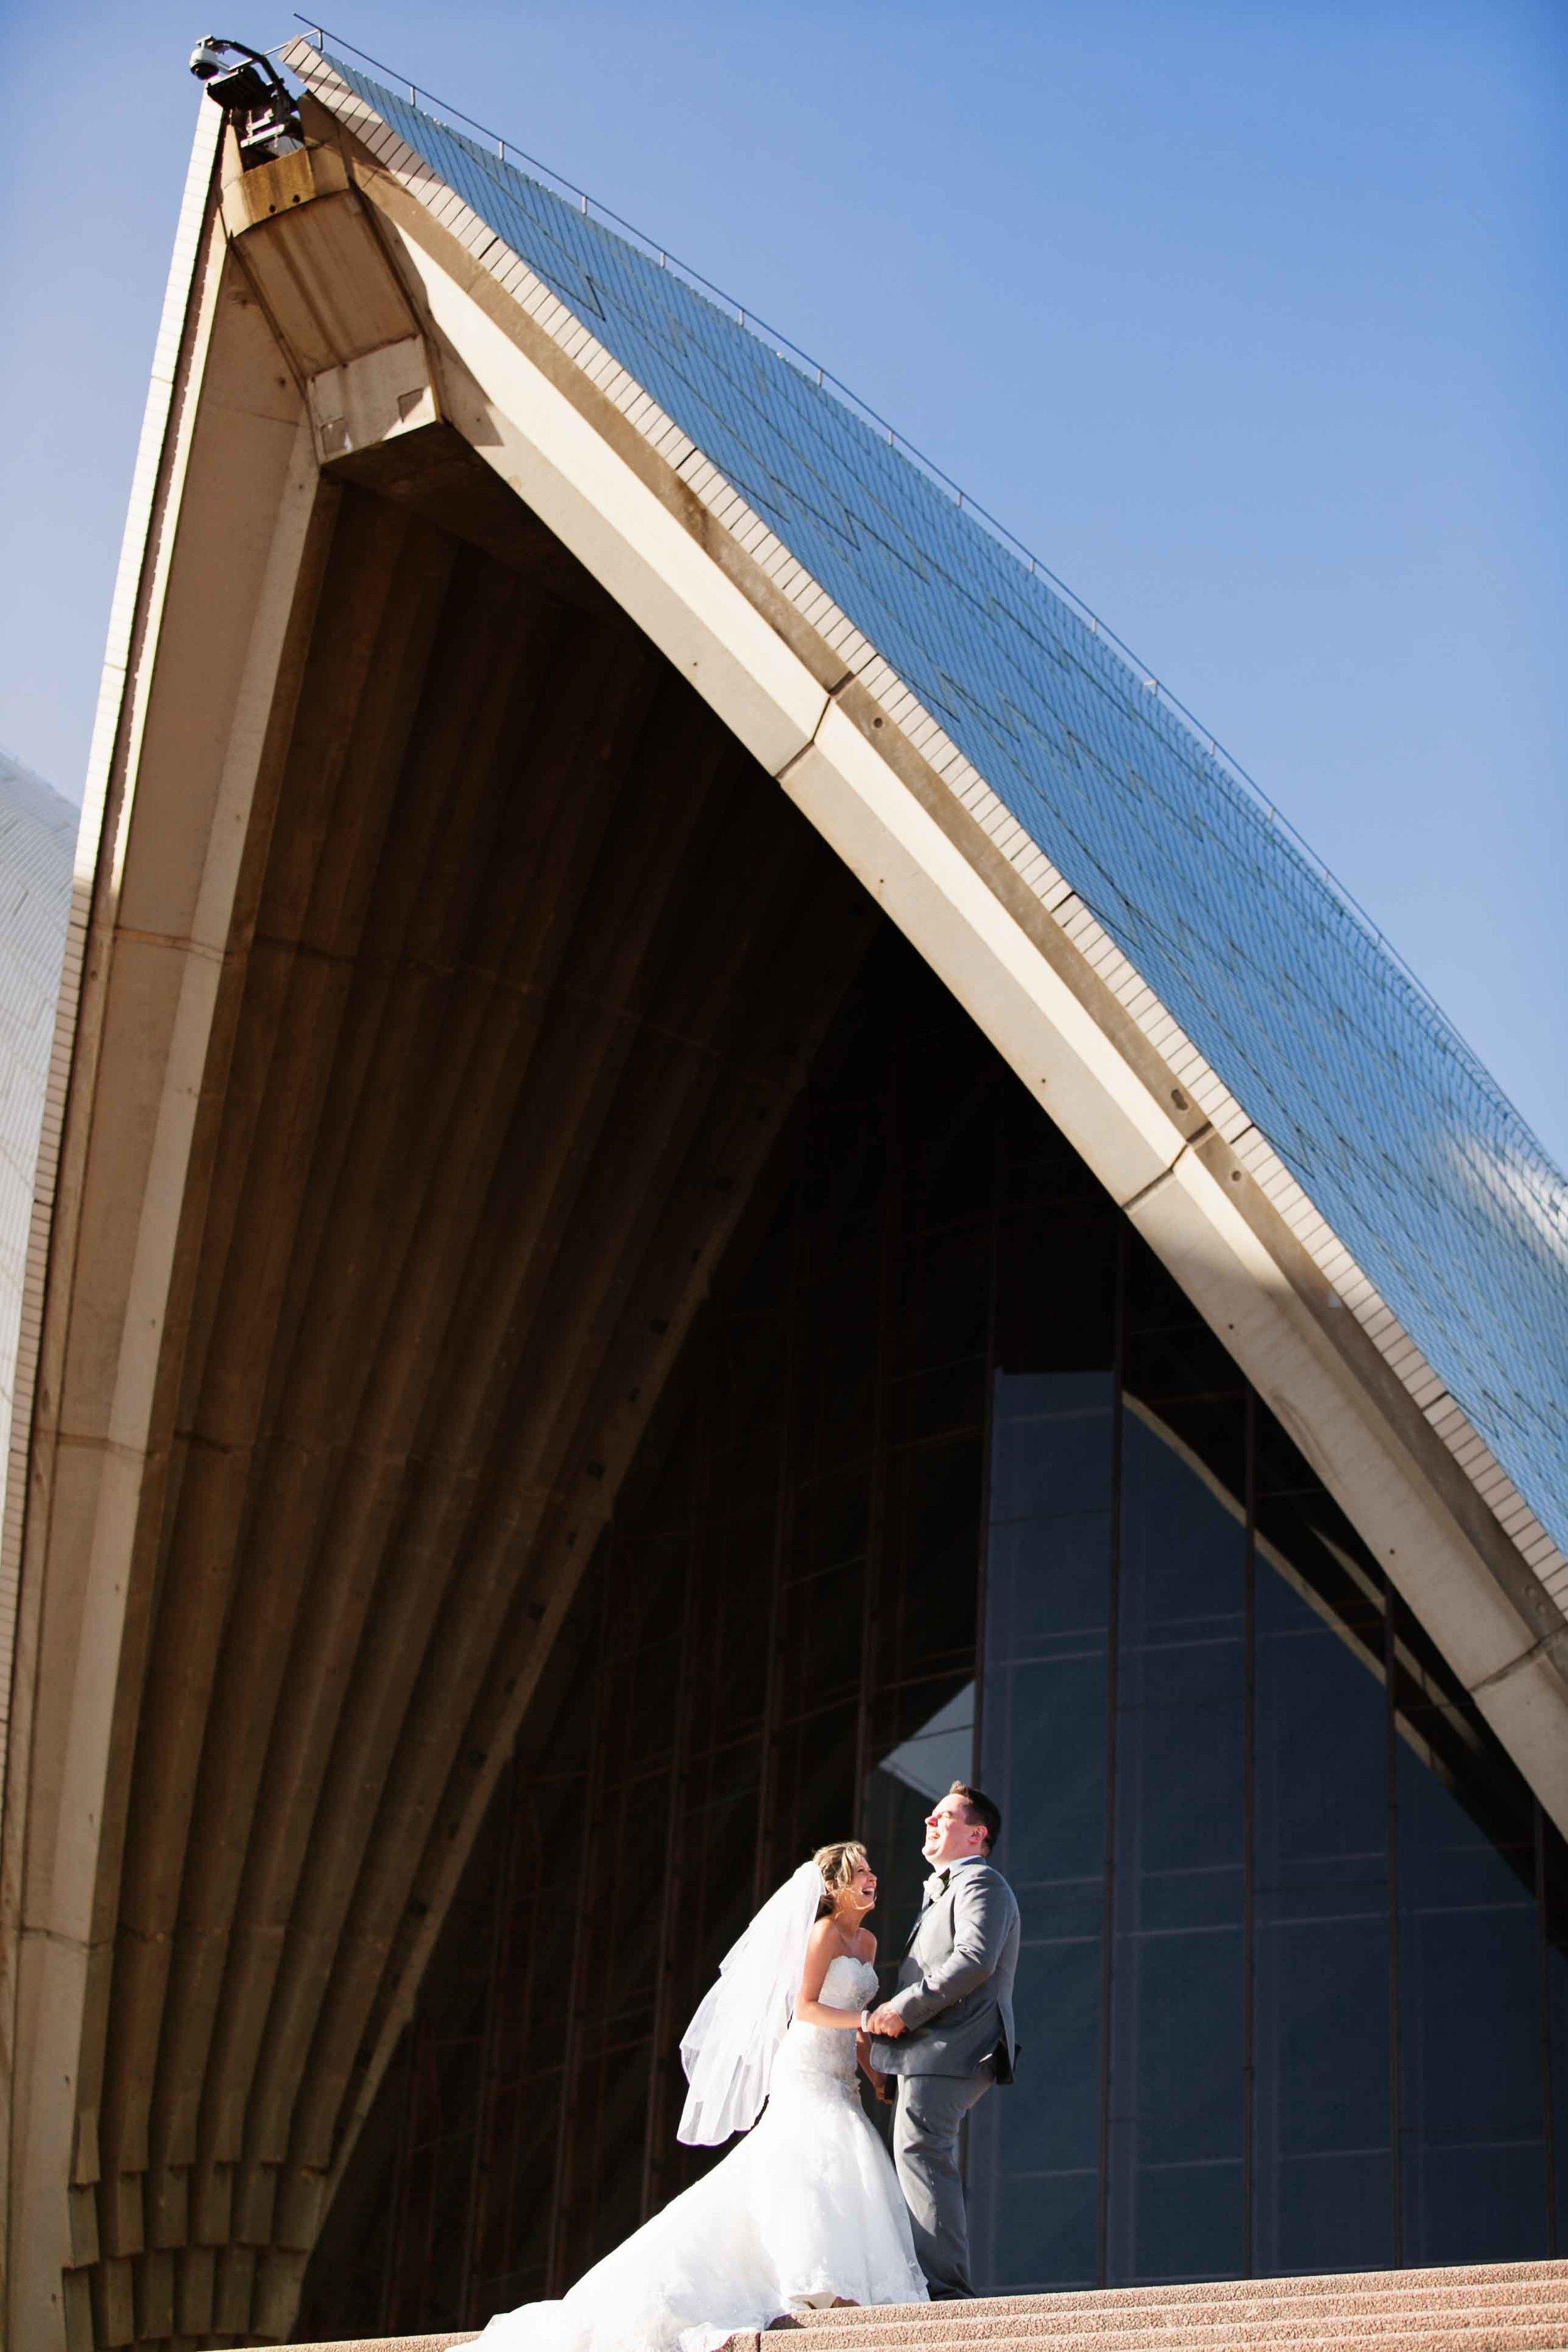 Kylie and Travis wedding at Sydney Opera House